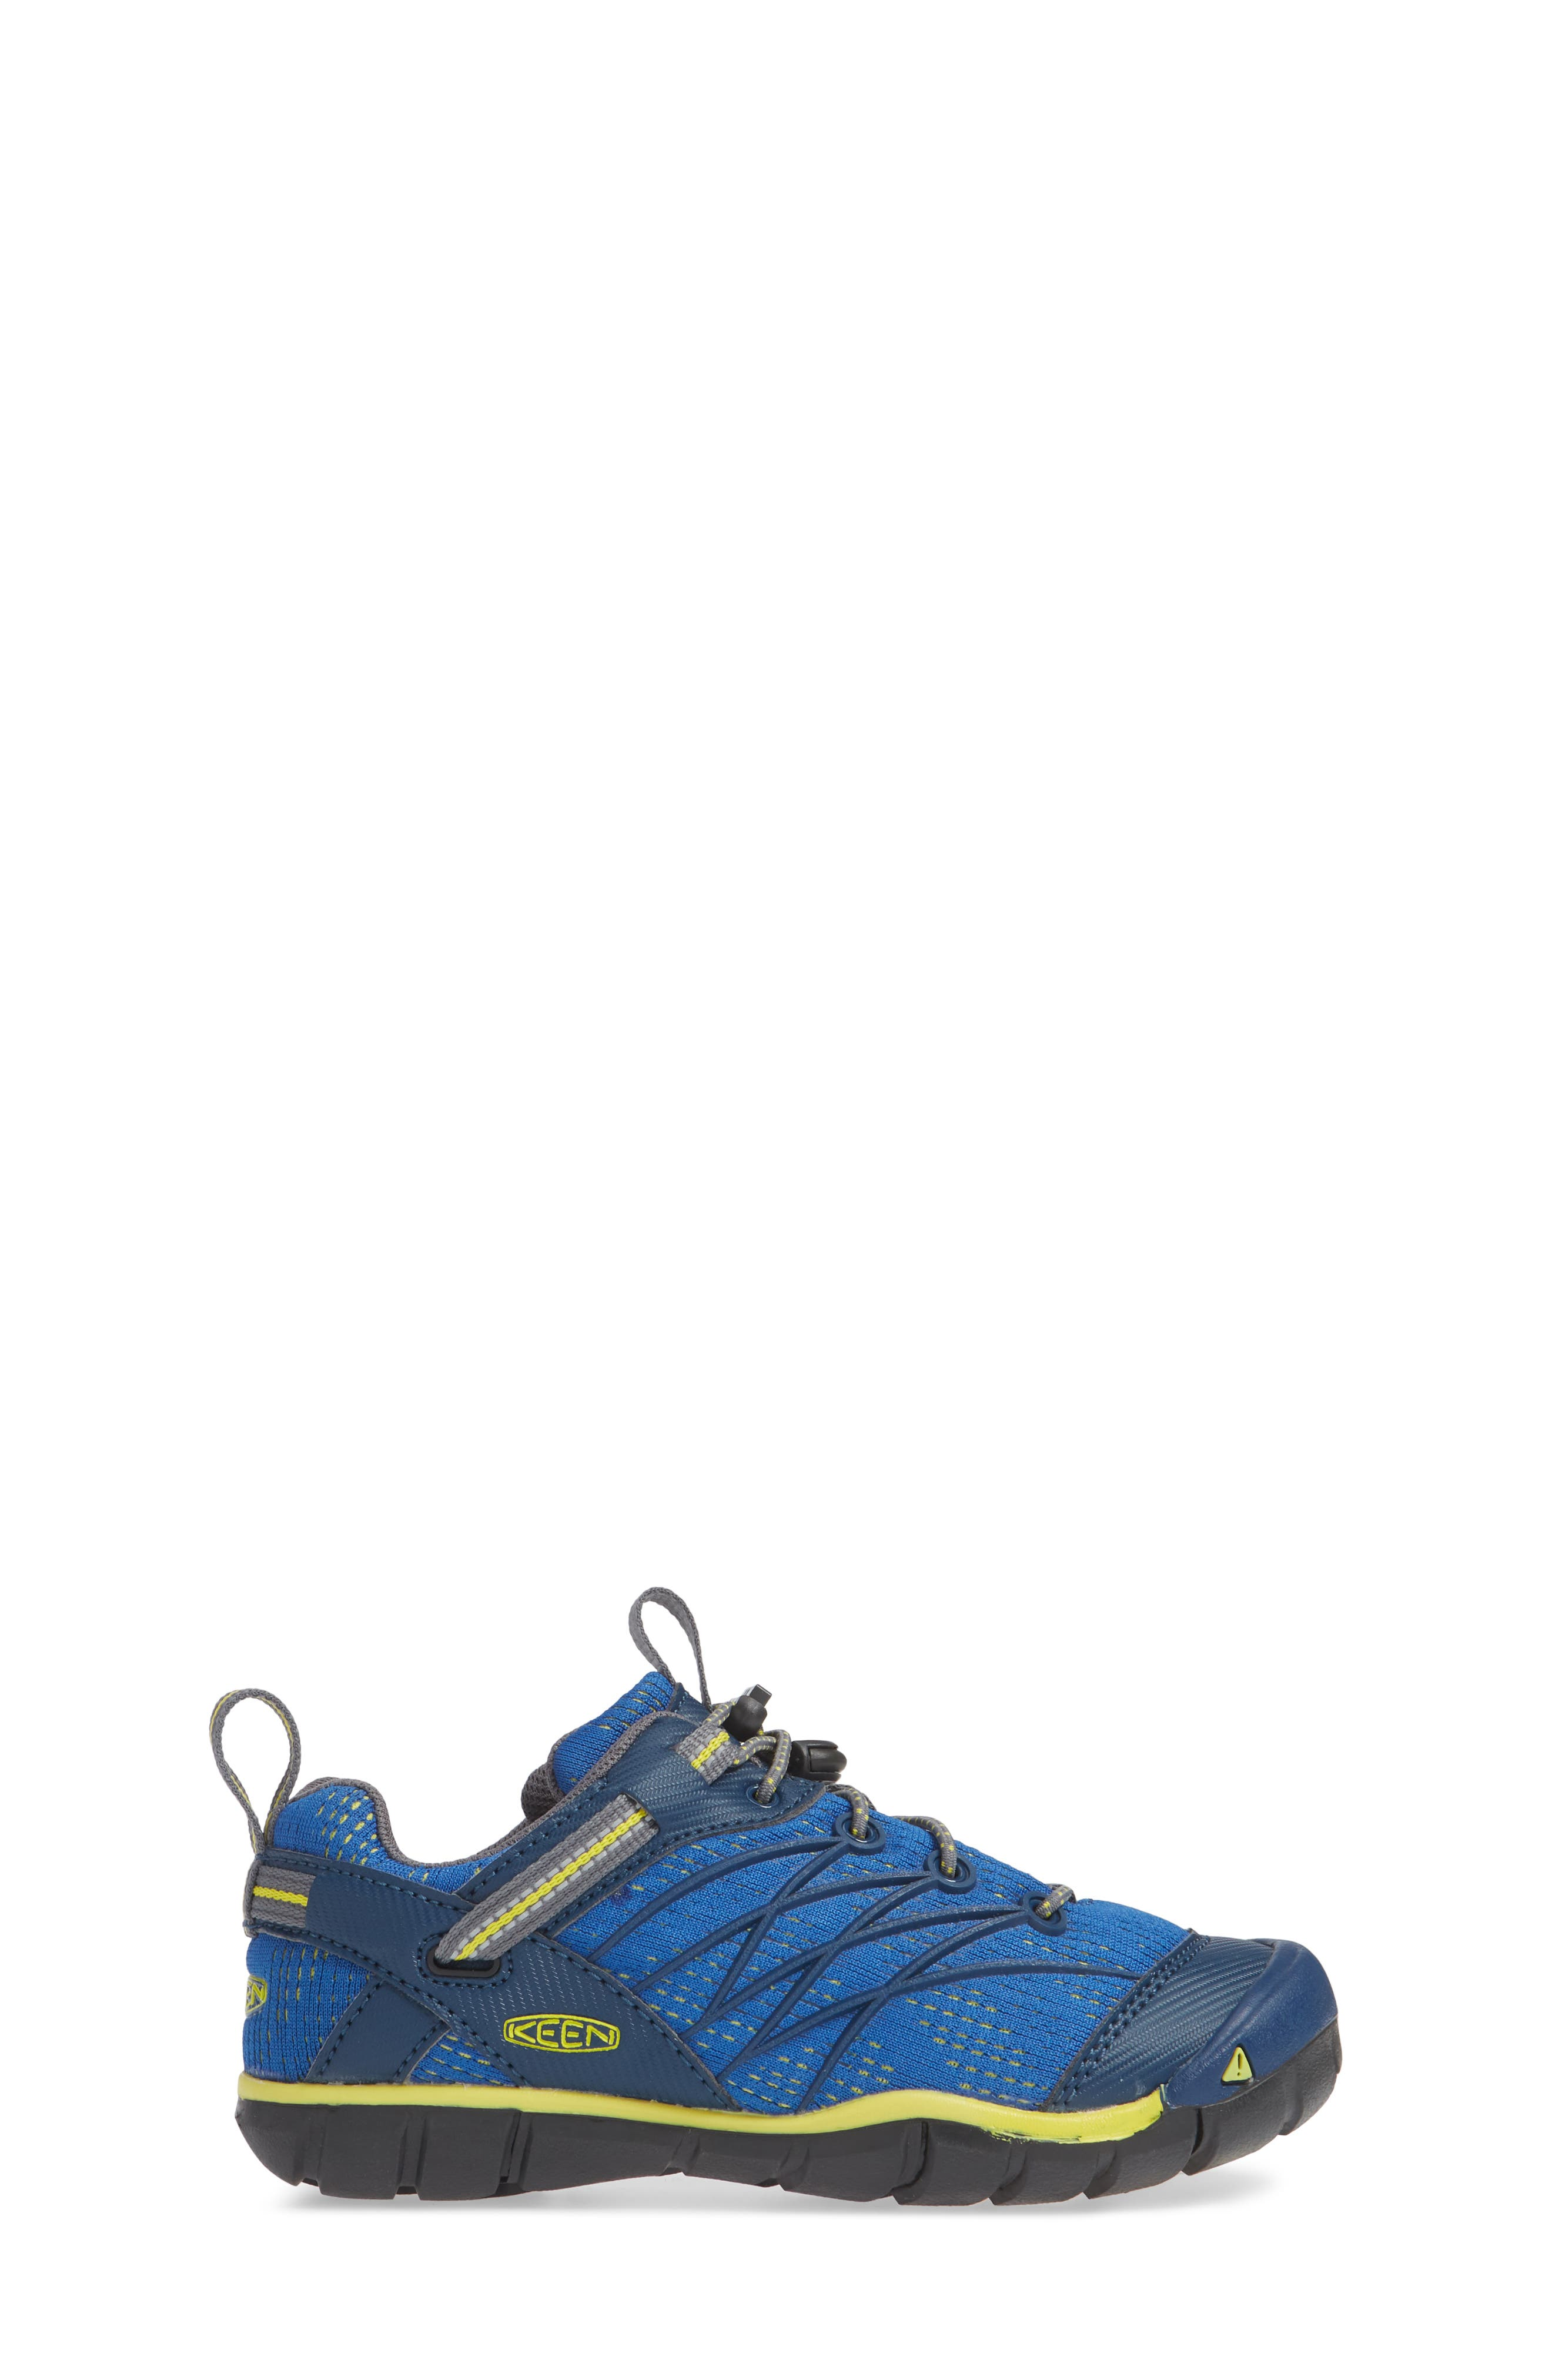 KEEN, 'Chandler CNX' Water Friendly Sneaker, Alternate thumbnail 3, color, BLUE OPAL/ BLUE